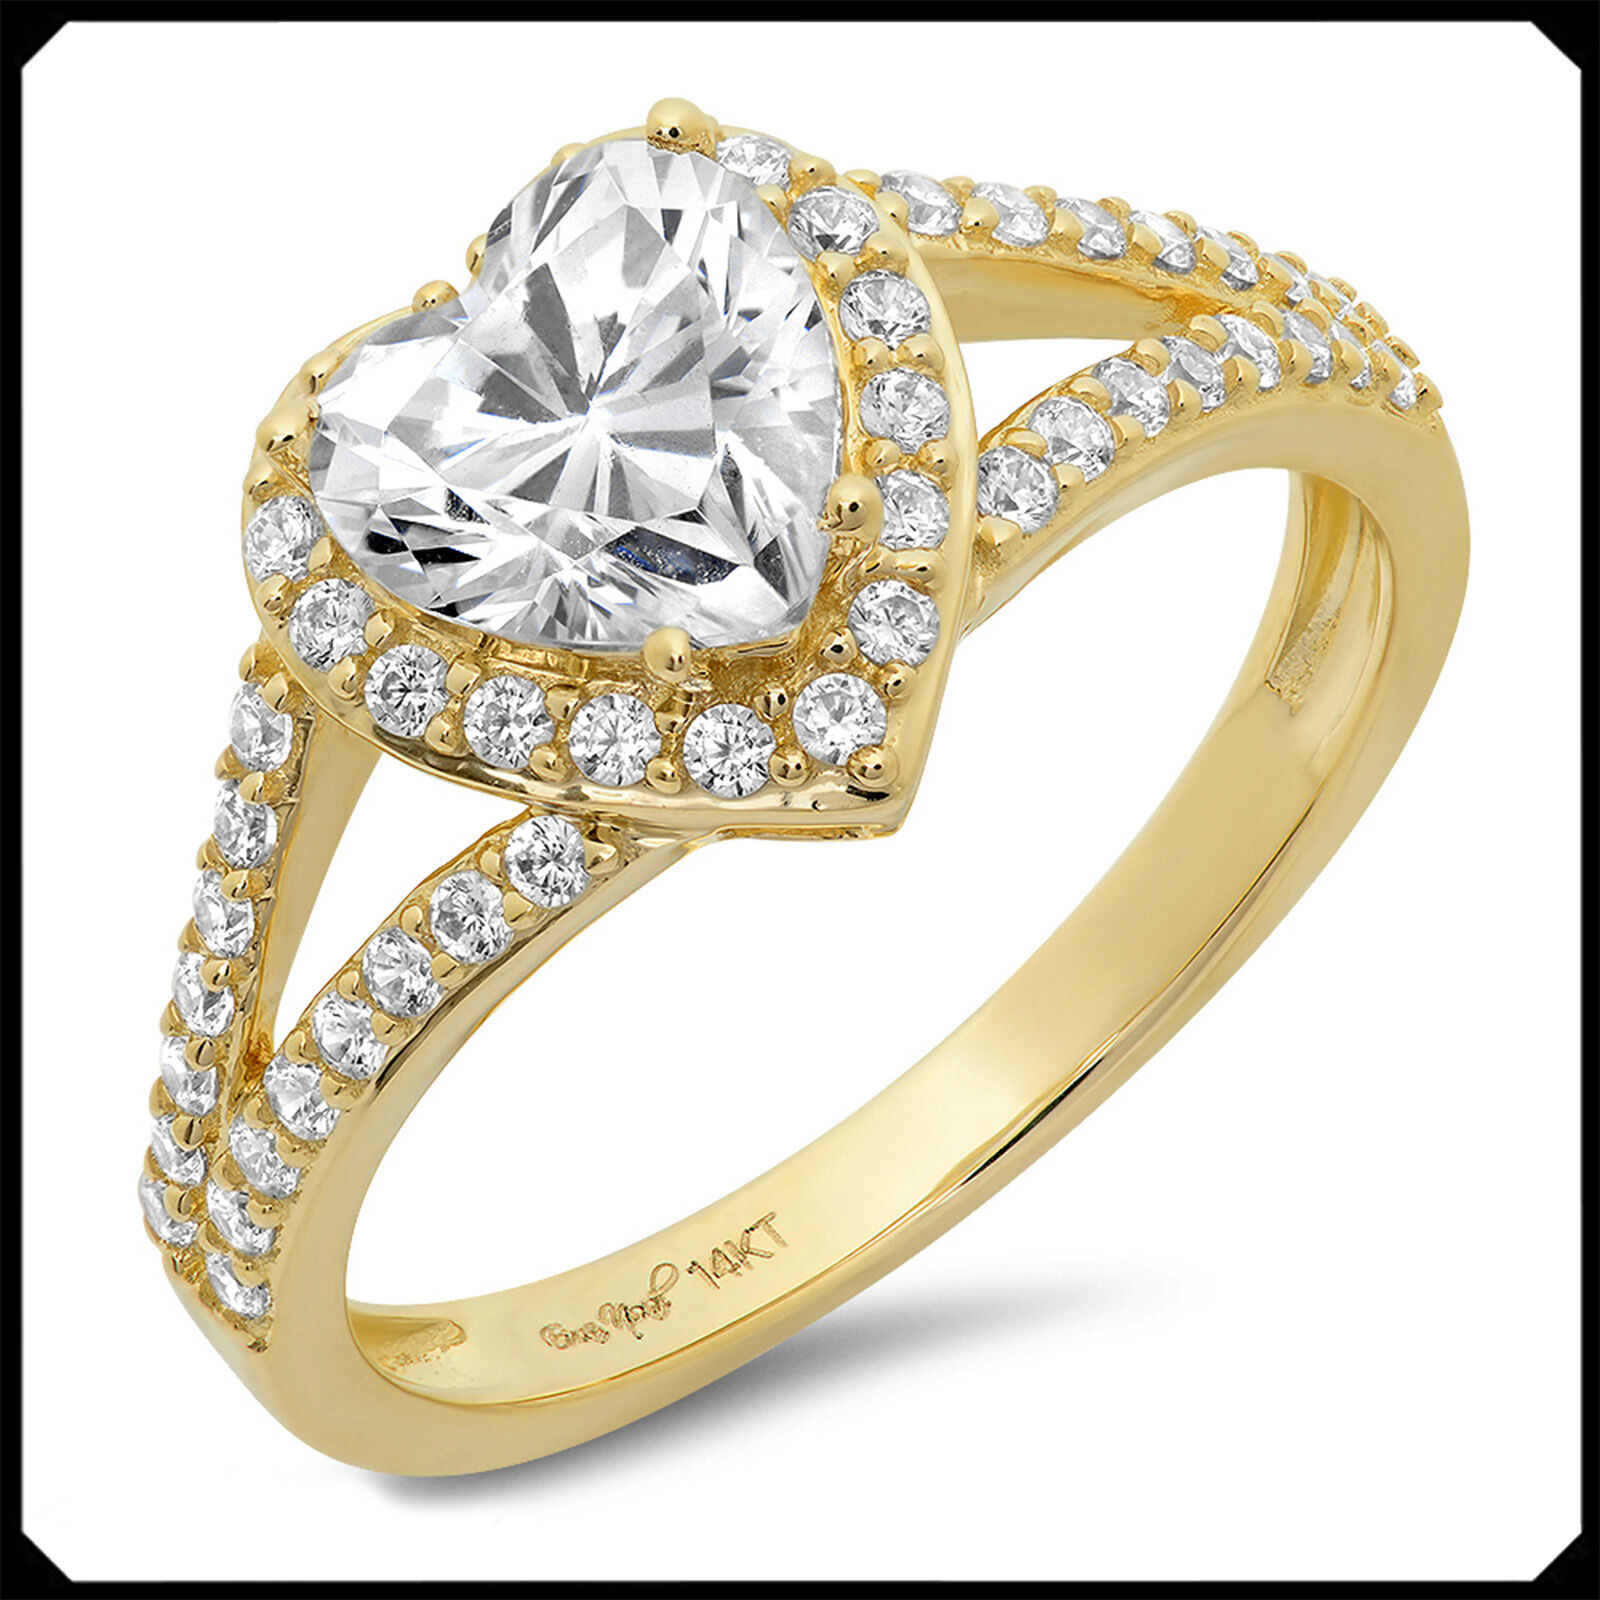 Mary 1.70CT HEART cut Diamond VVS1 Solid 14K Yellow gold Engagement Wedding Ring